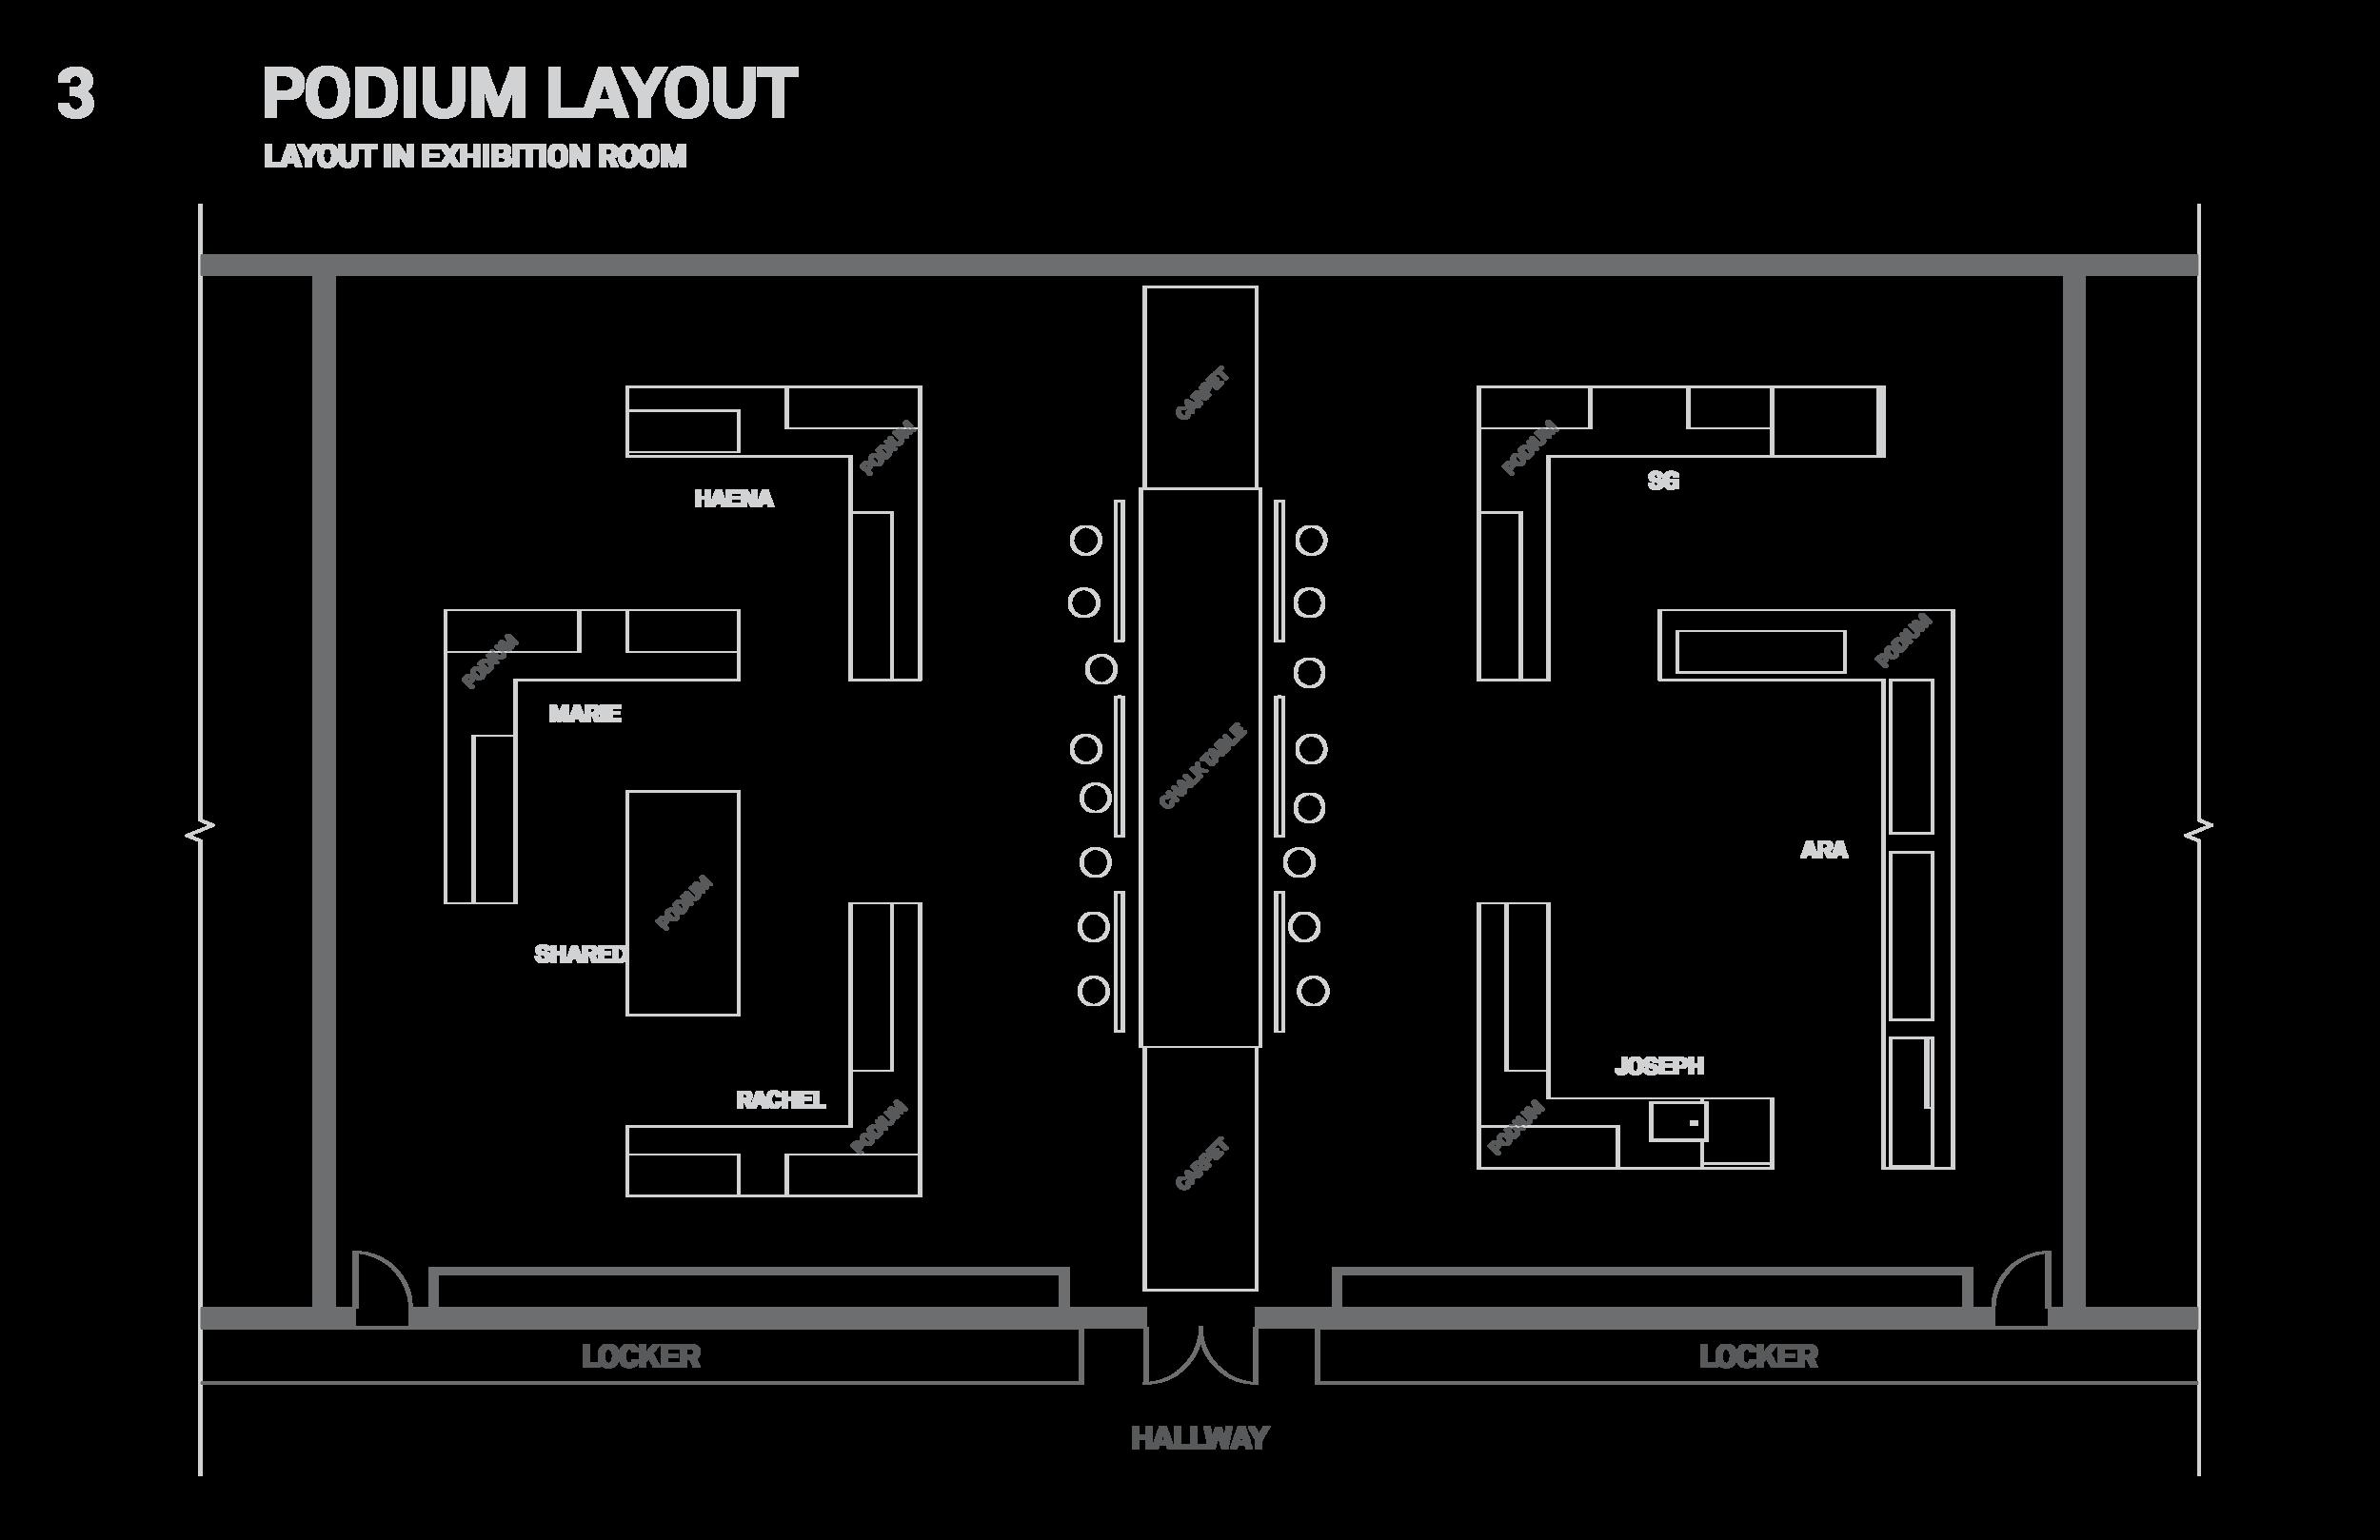 podium layouts2-04.png